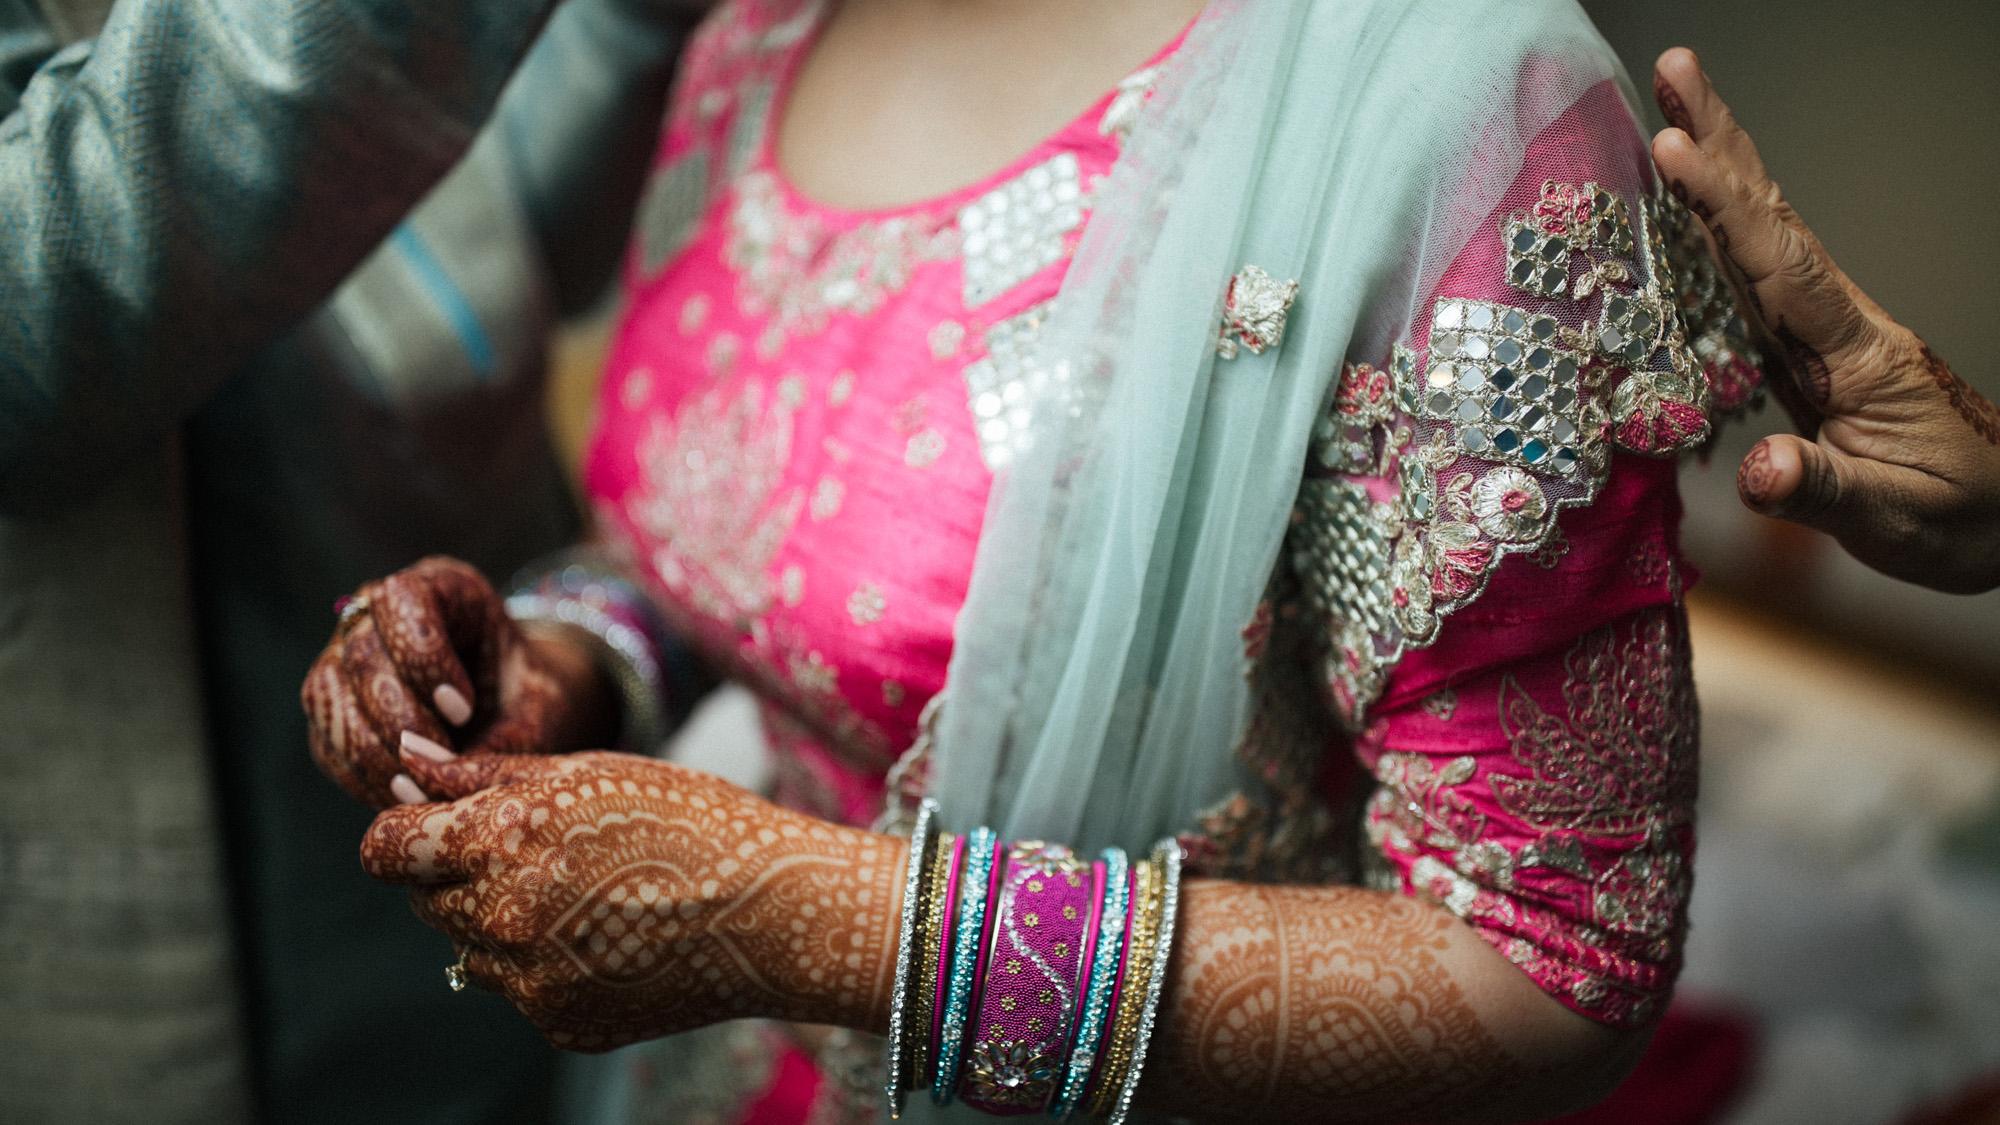 anu_maneesh_alec_vanderboom_Indian_wedding_photography-0013.jpg